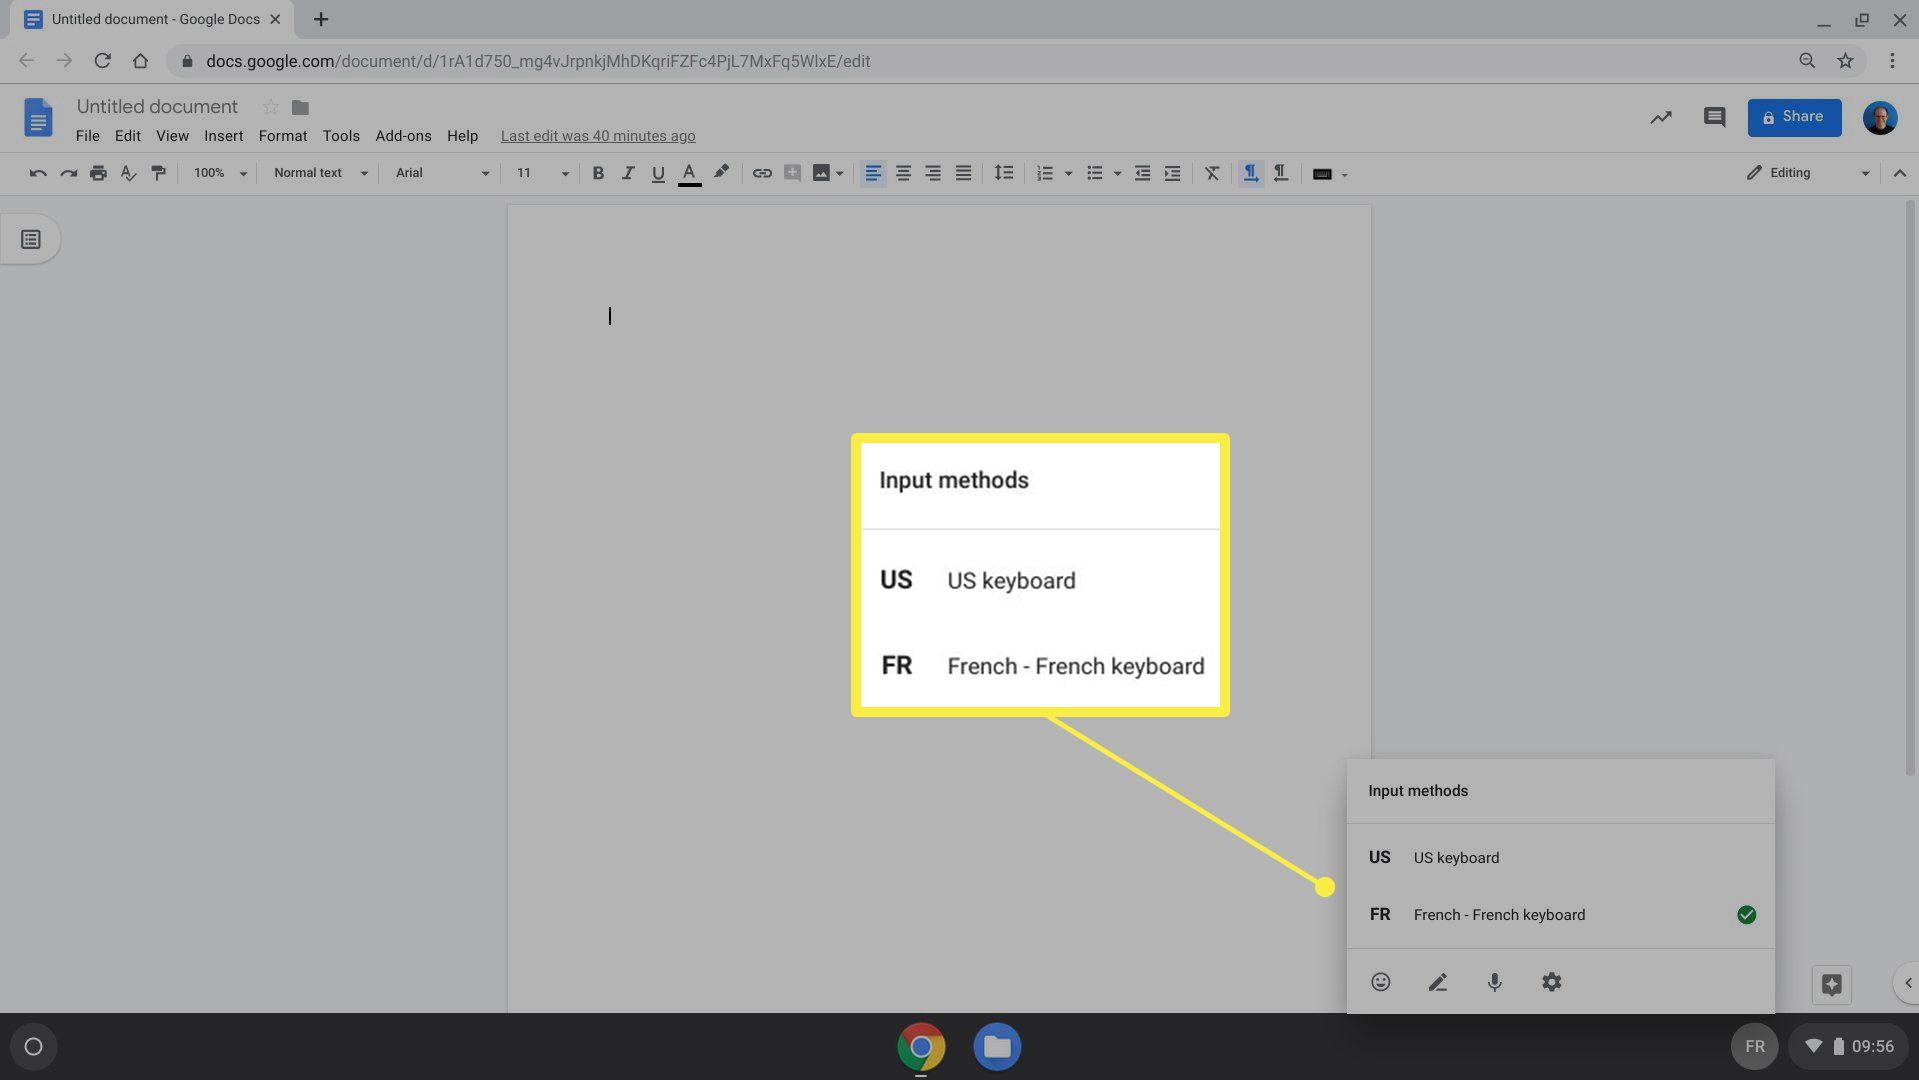 Chrome OS input methods options